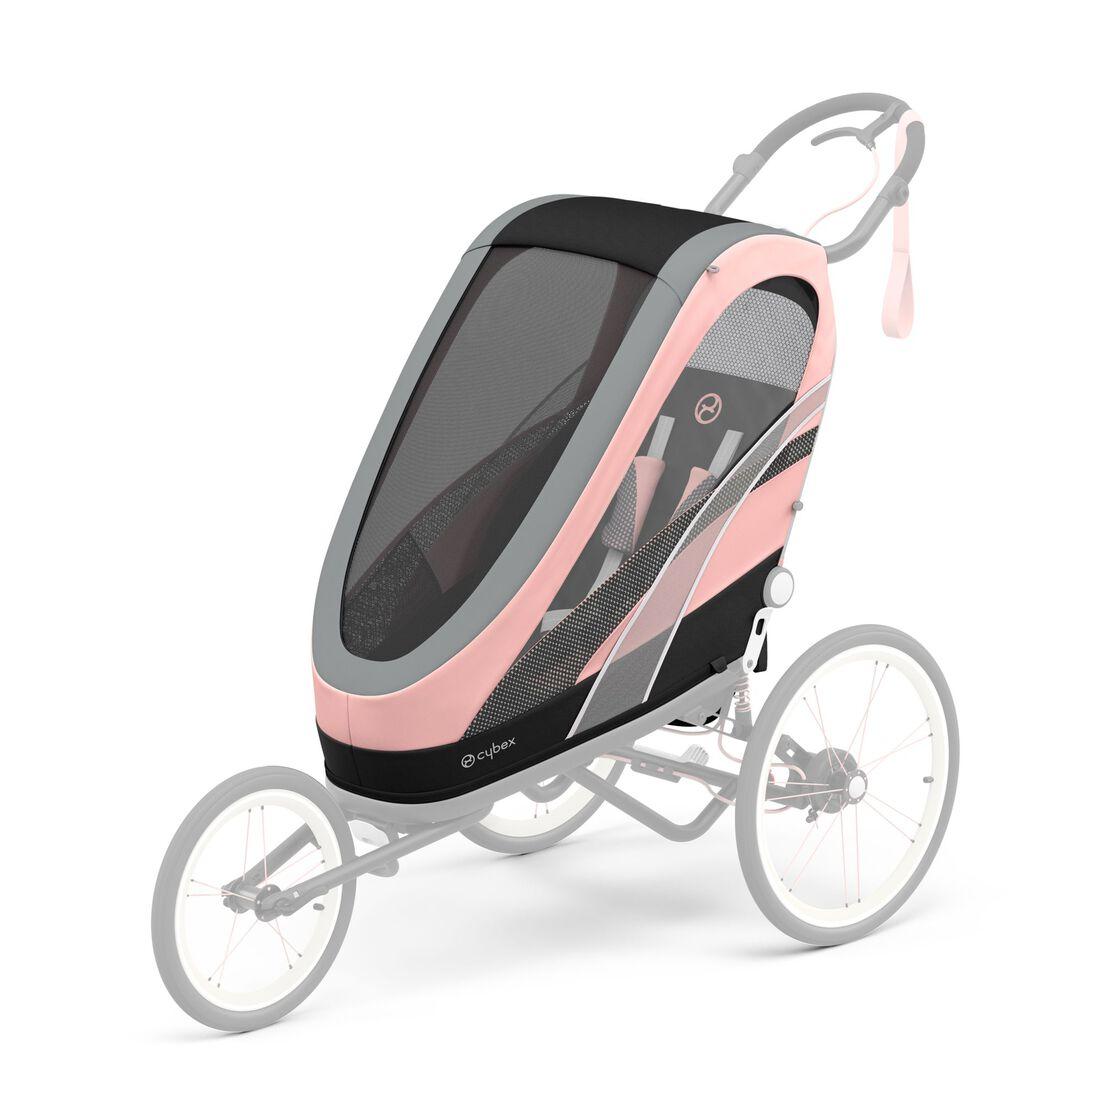 CYBEX Zeno Sitzpaket - Silver Pink in Silver Pink large Bild 1